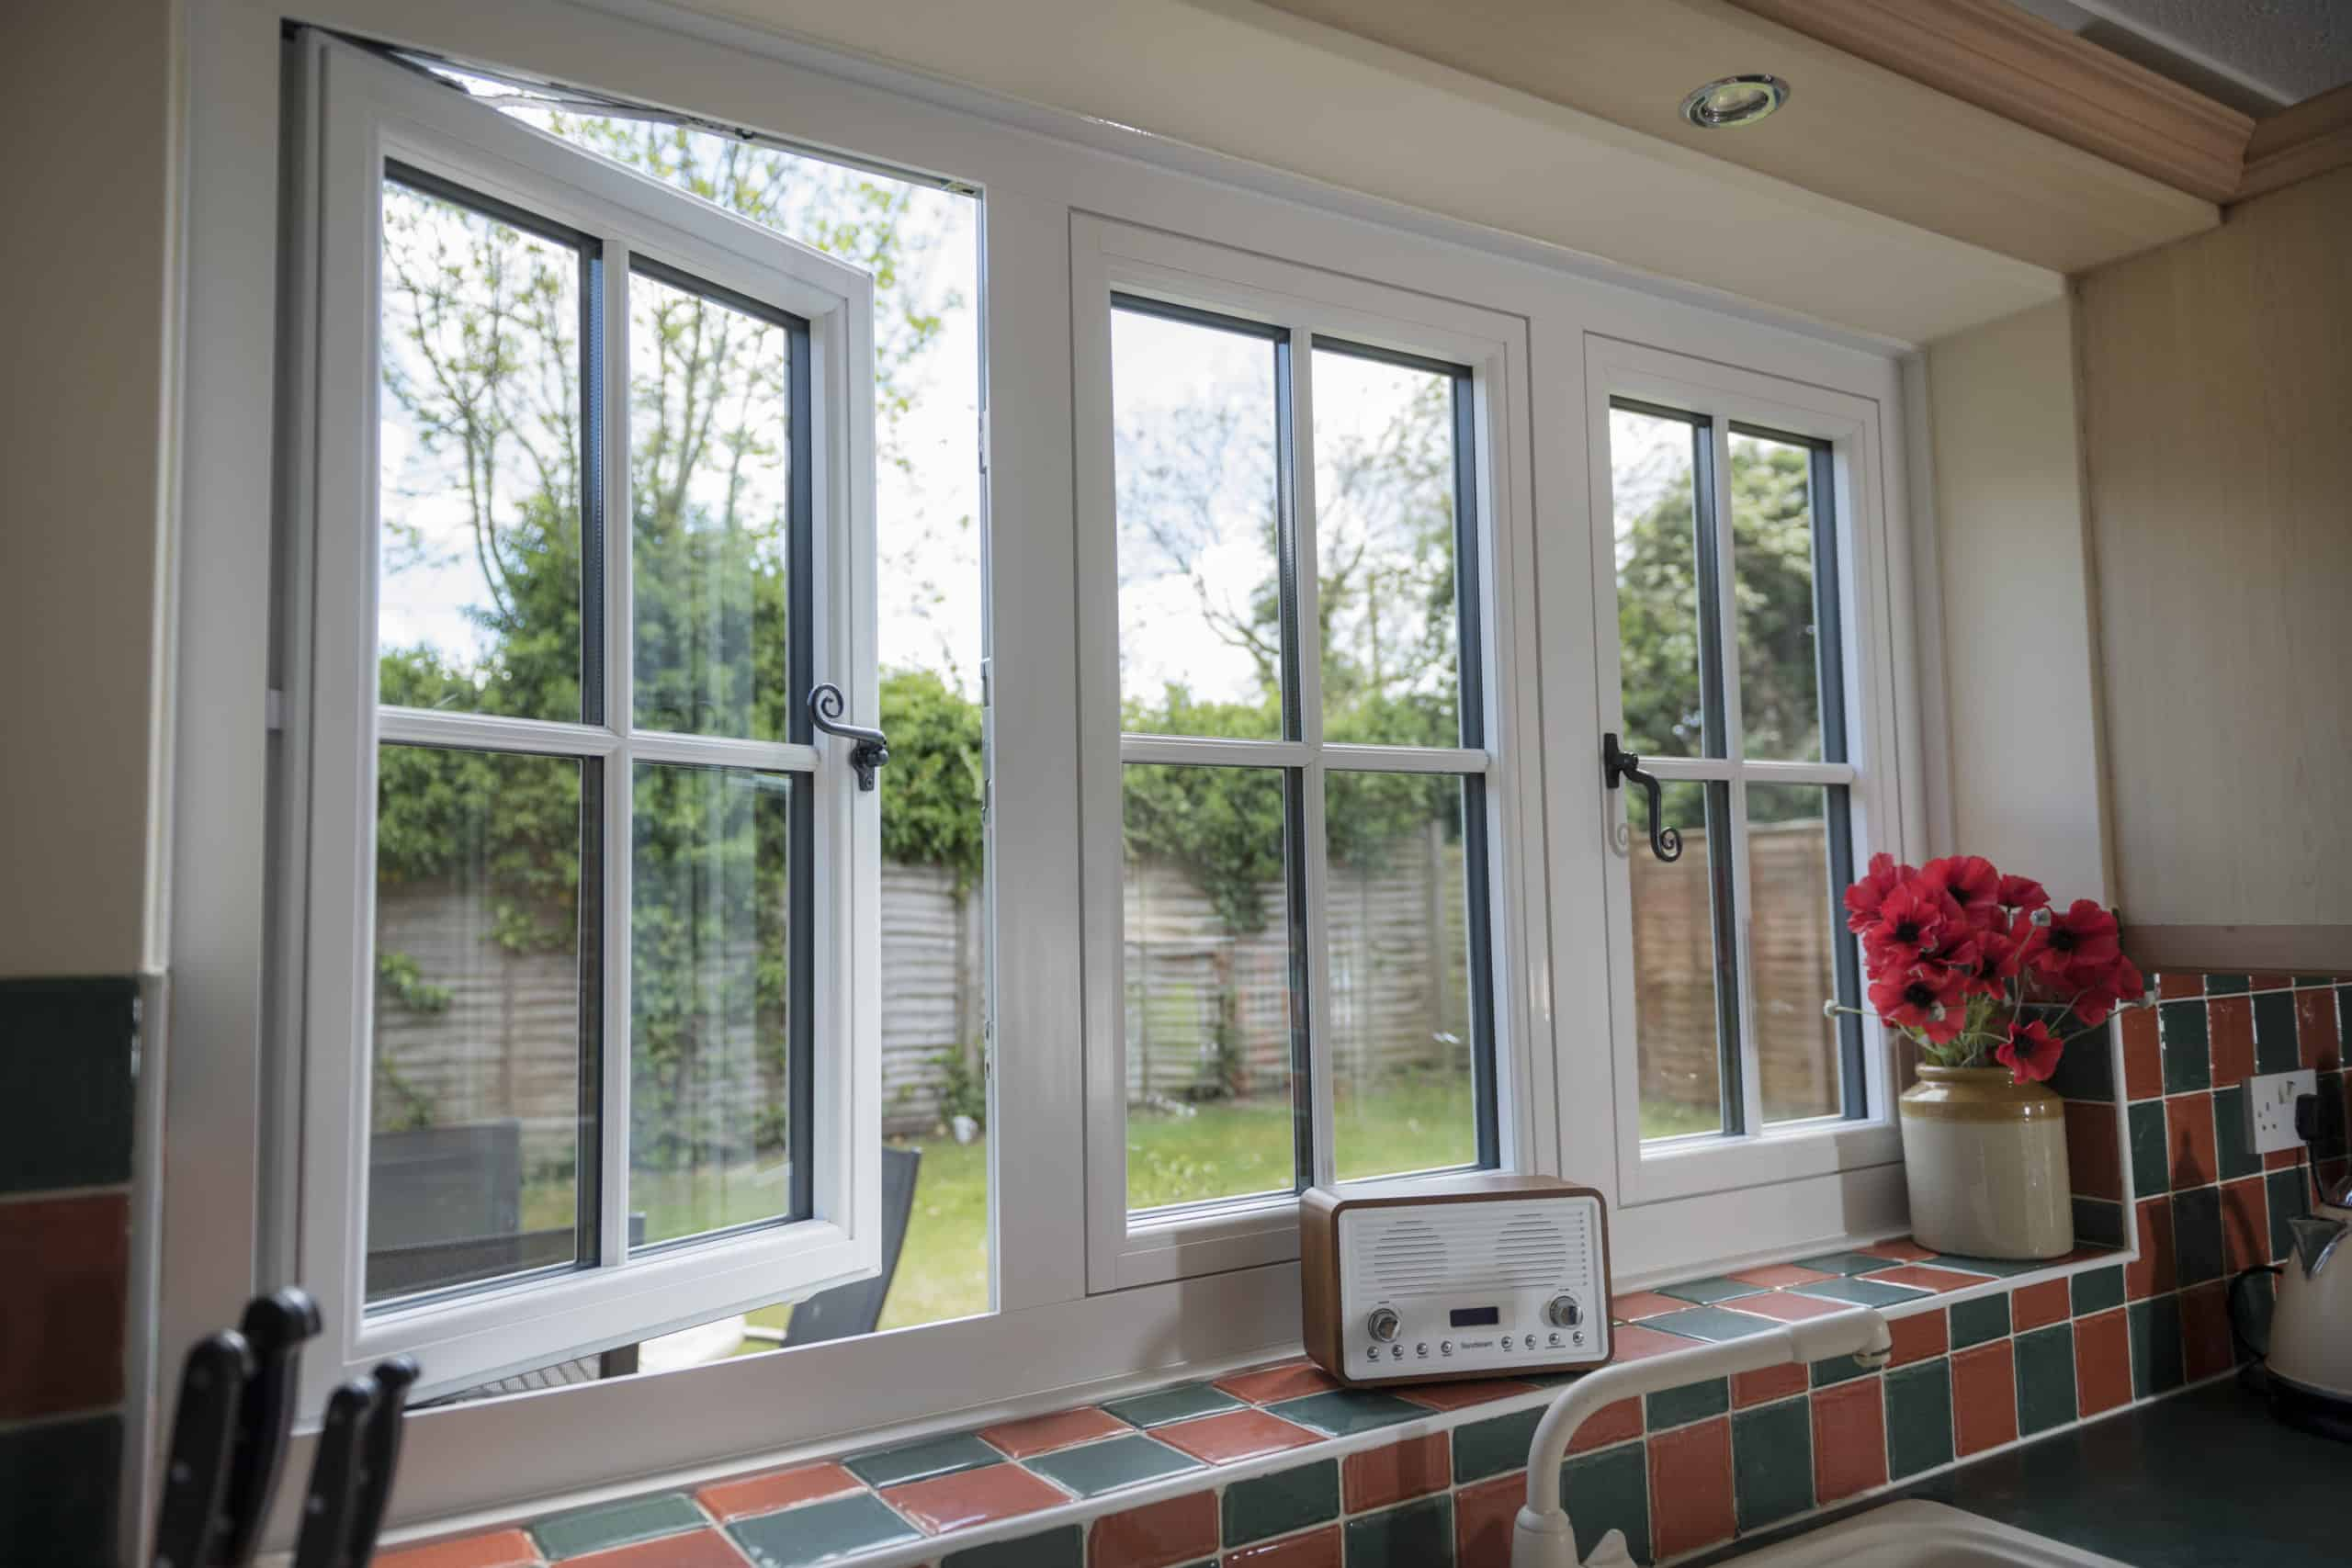 Residence windows cornwall